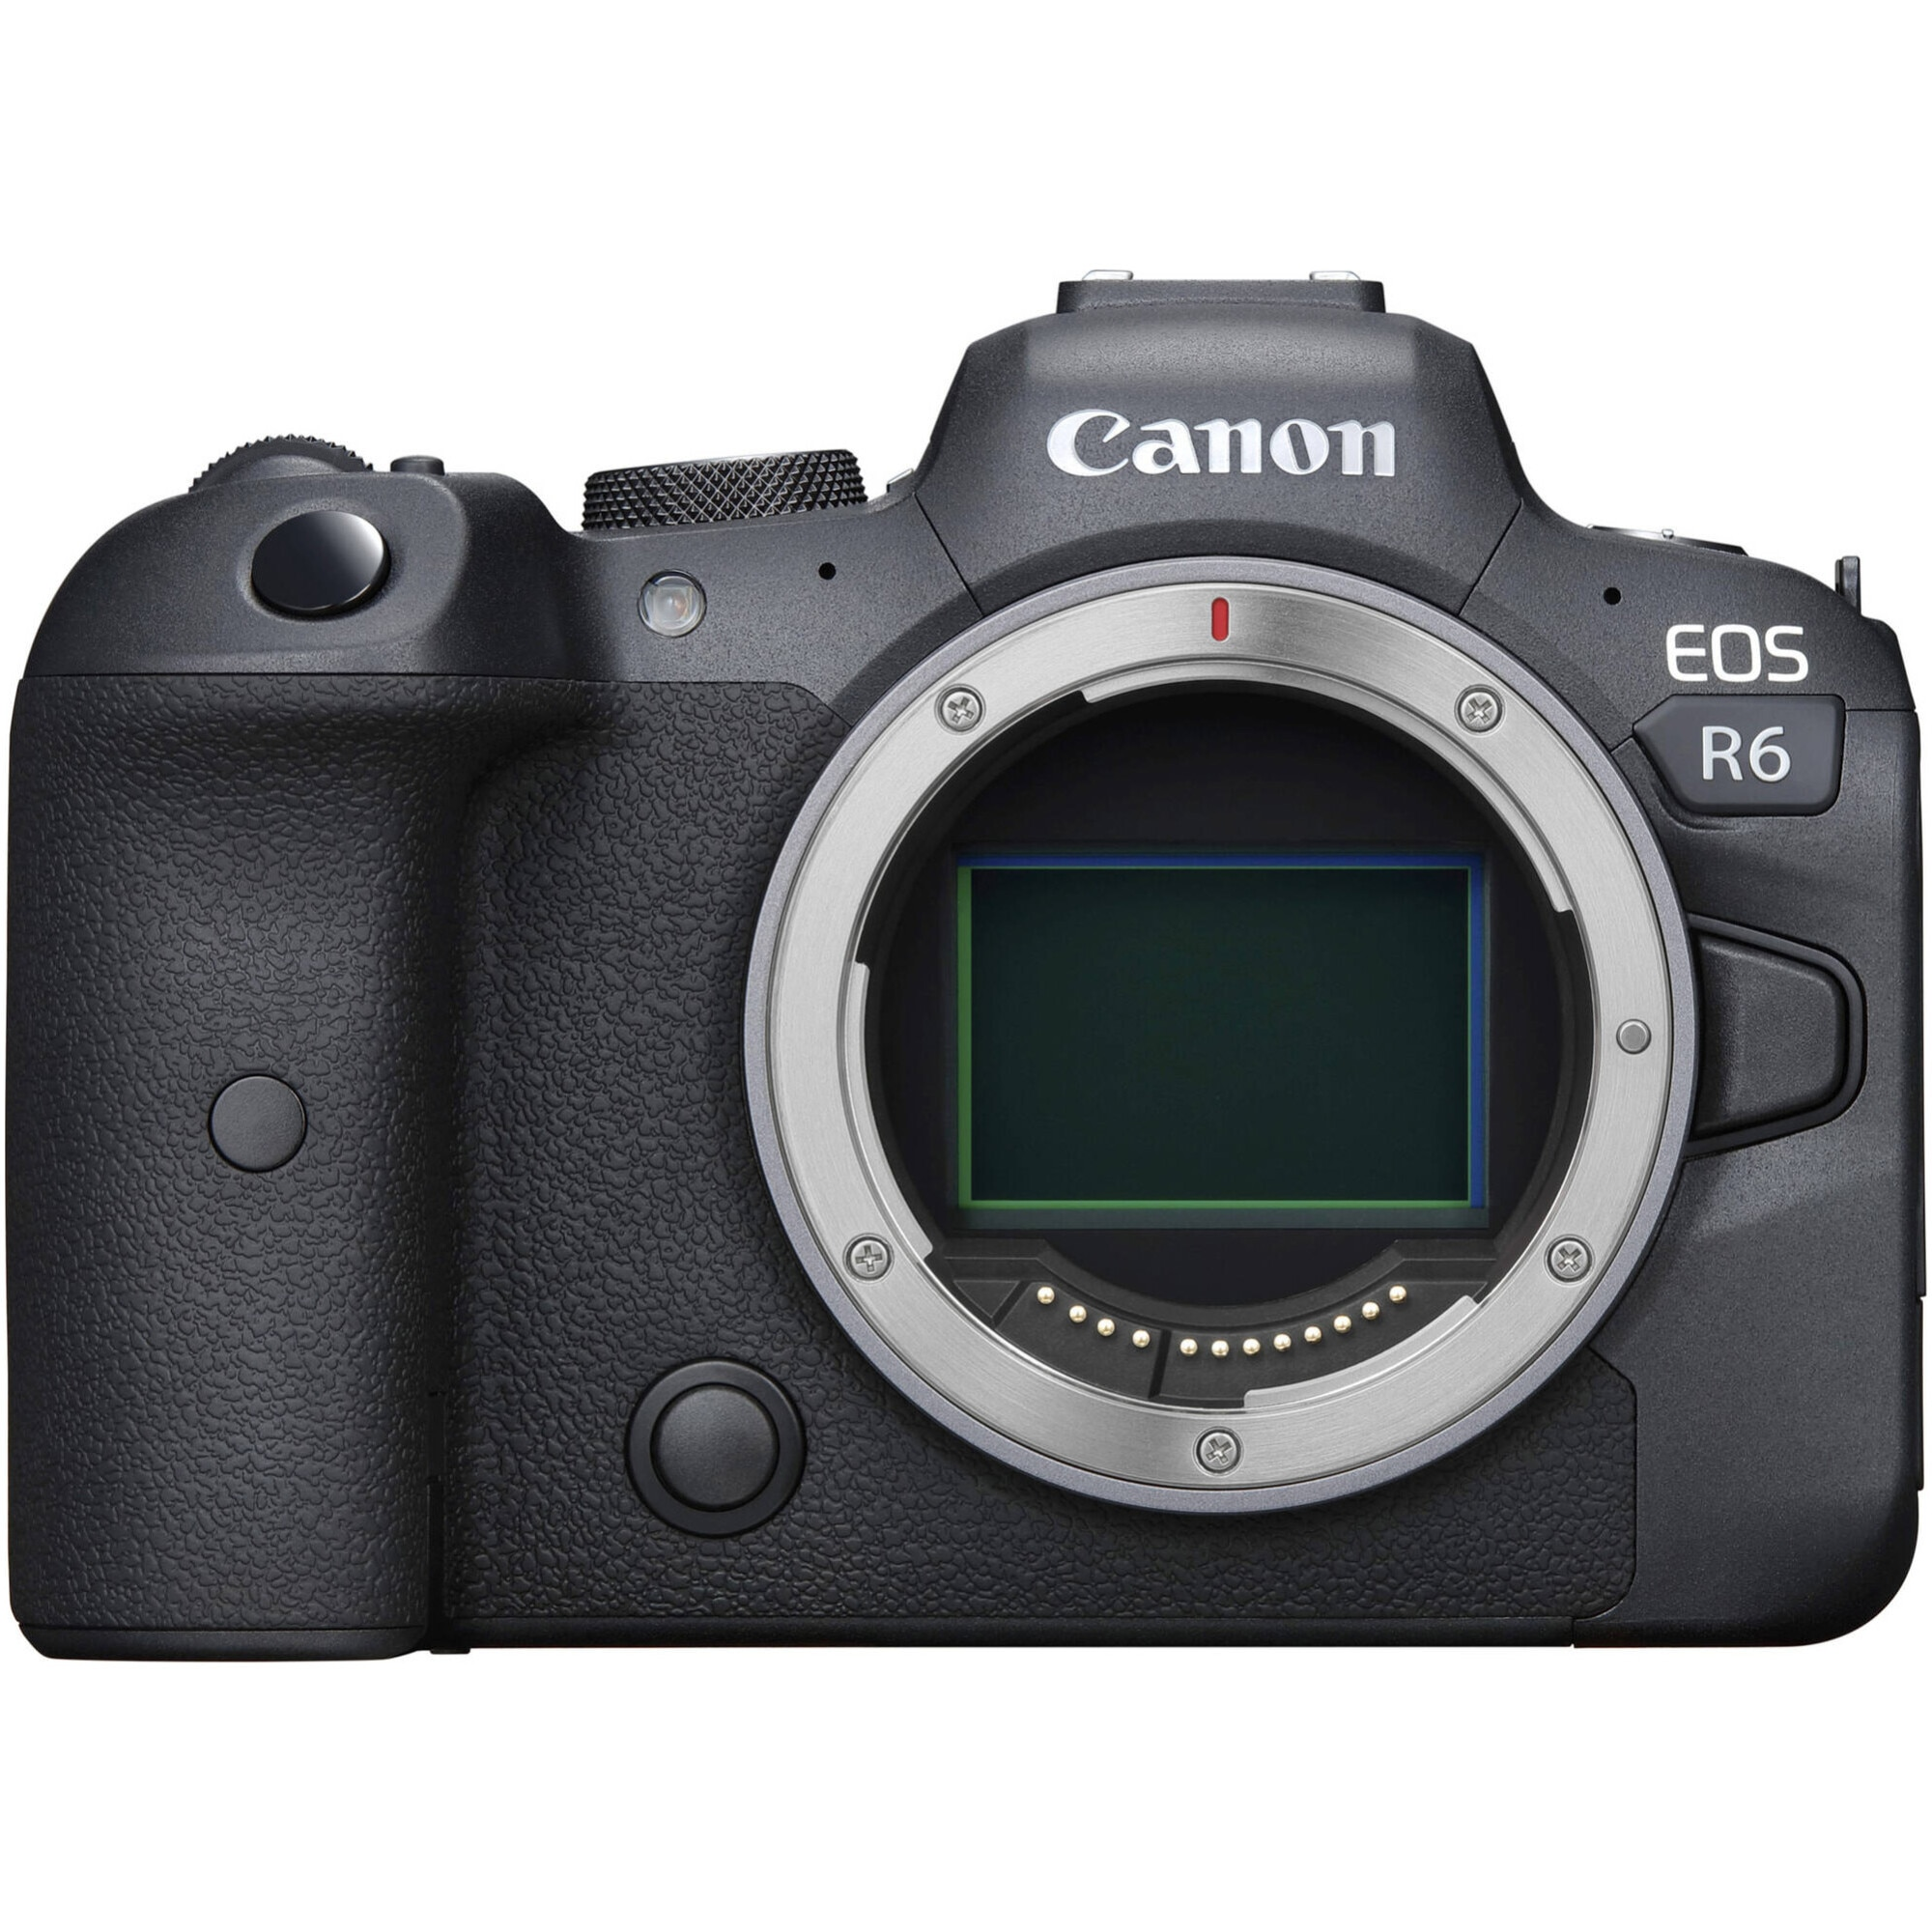 Fotografie Aparat Foto Mirorless Canon EOS R6, Full-Frame, 20.1 MP, 4K, Wi-Fi, Body